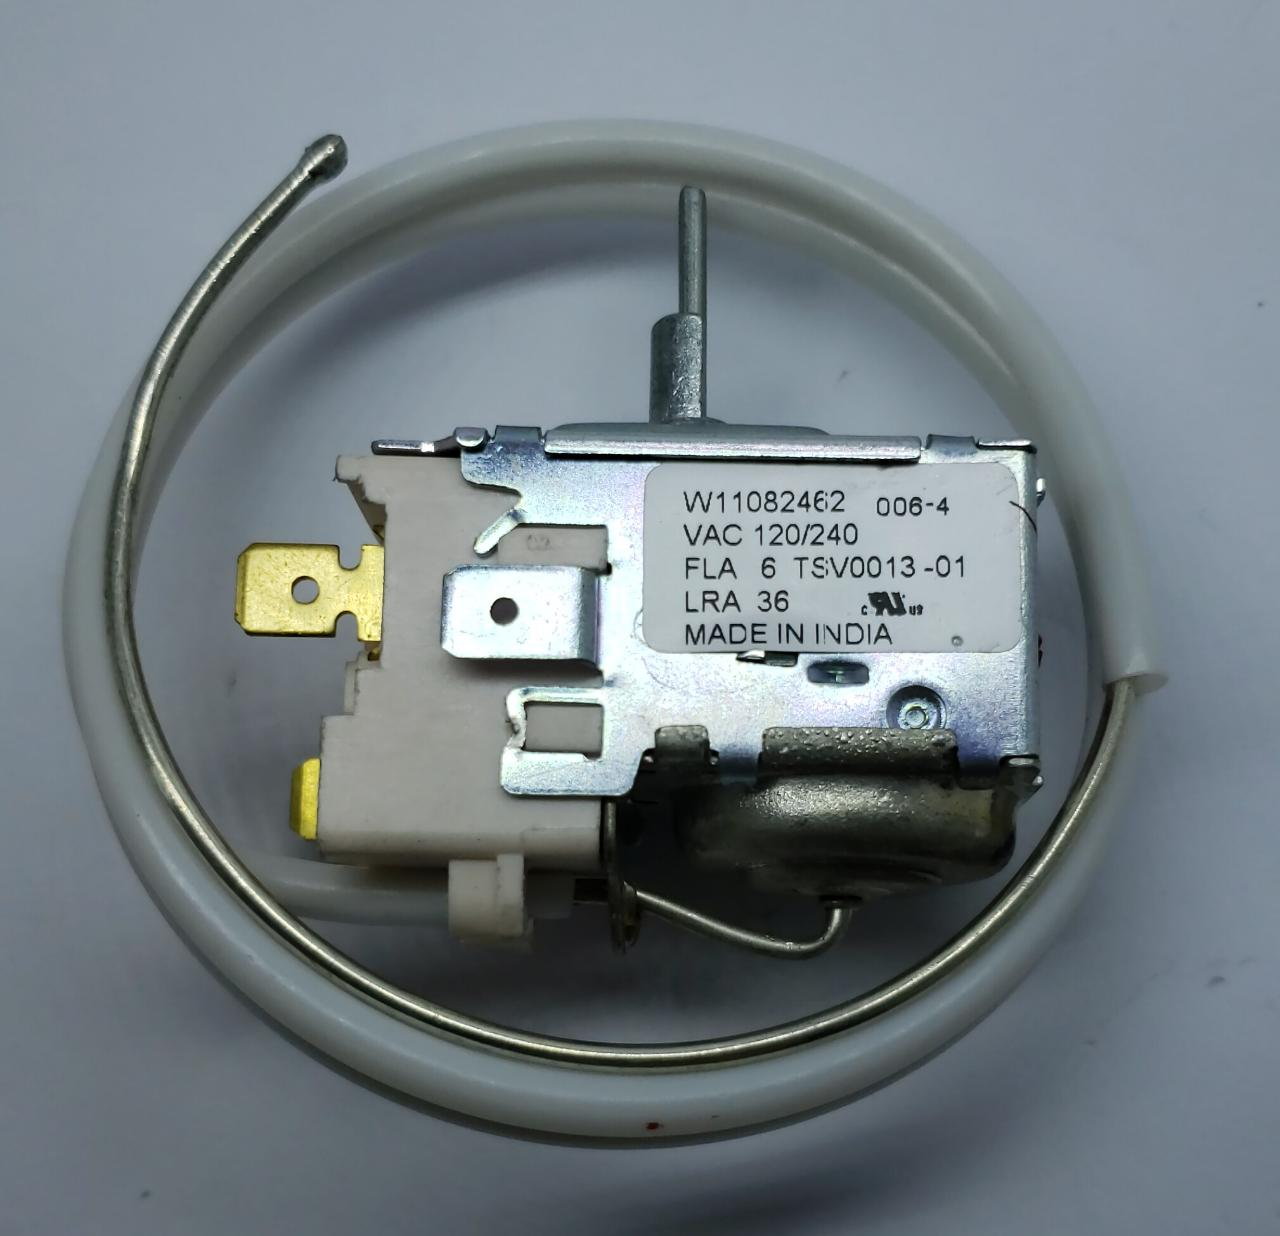 Termostato Freezer Consul Tsv0013 Cra28/30 Original W11082462